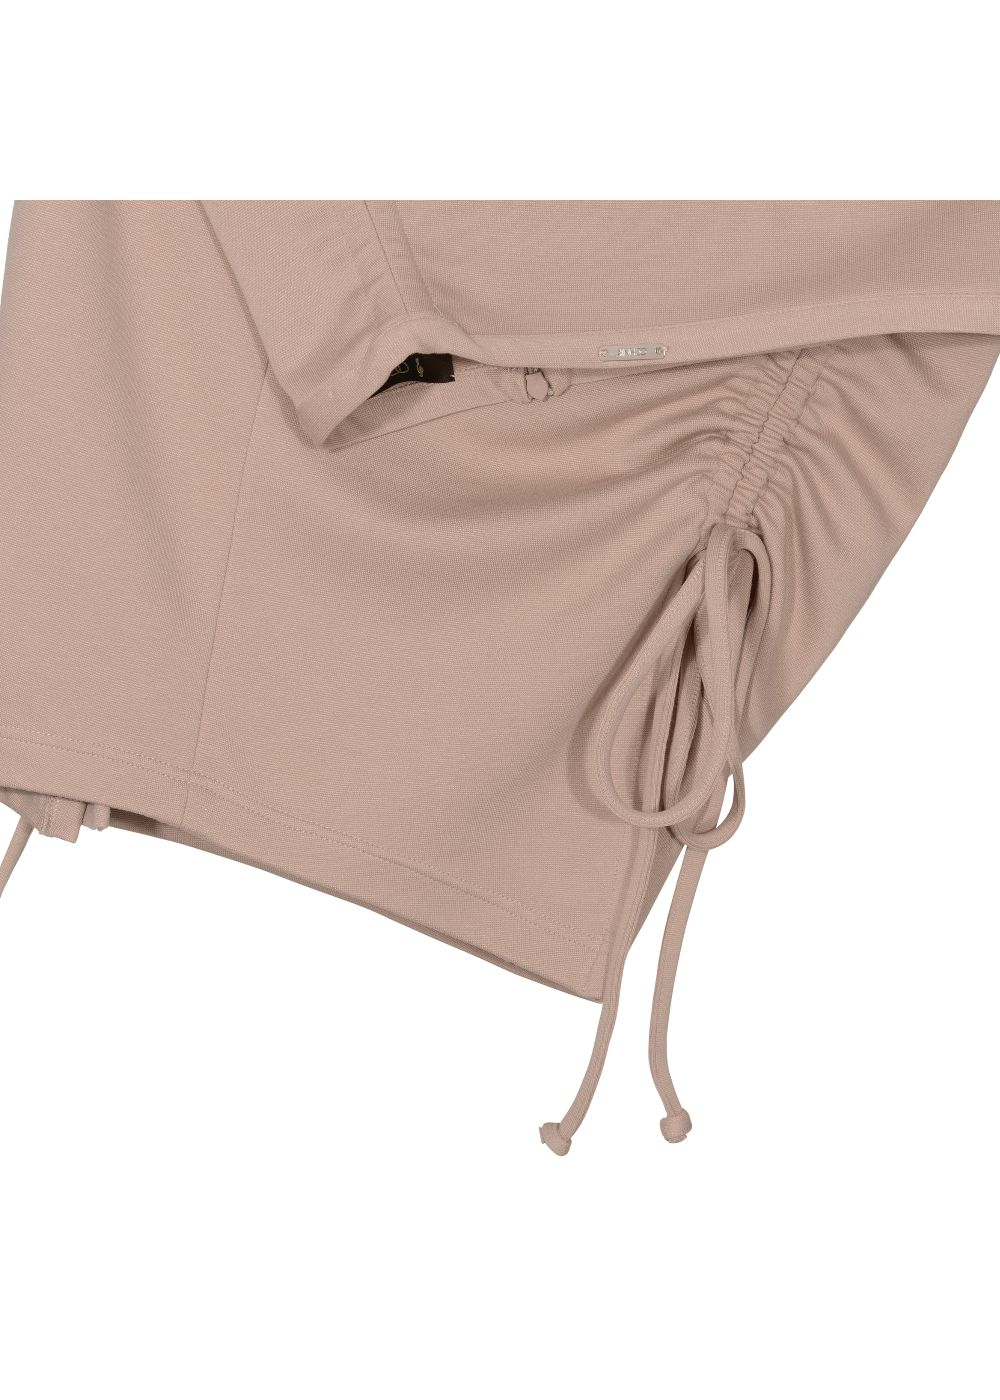 Spódnica damska SPCDT-0024-31(W19)